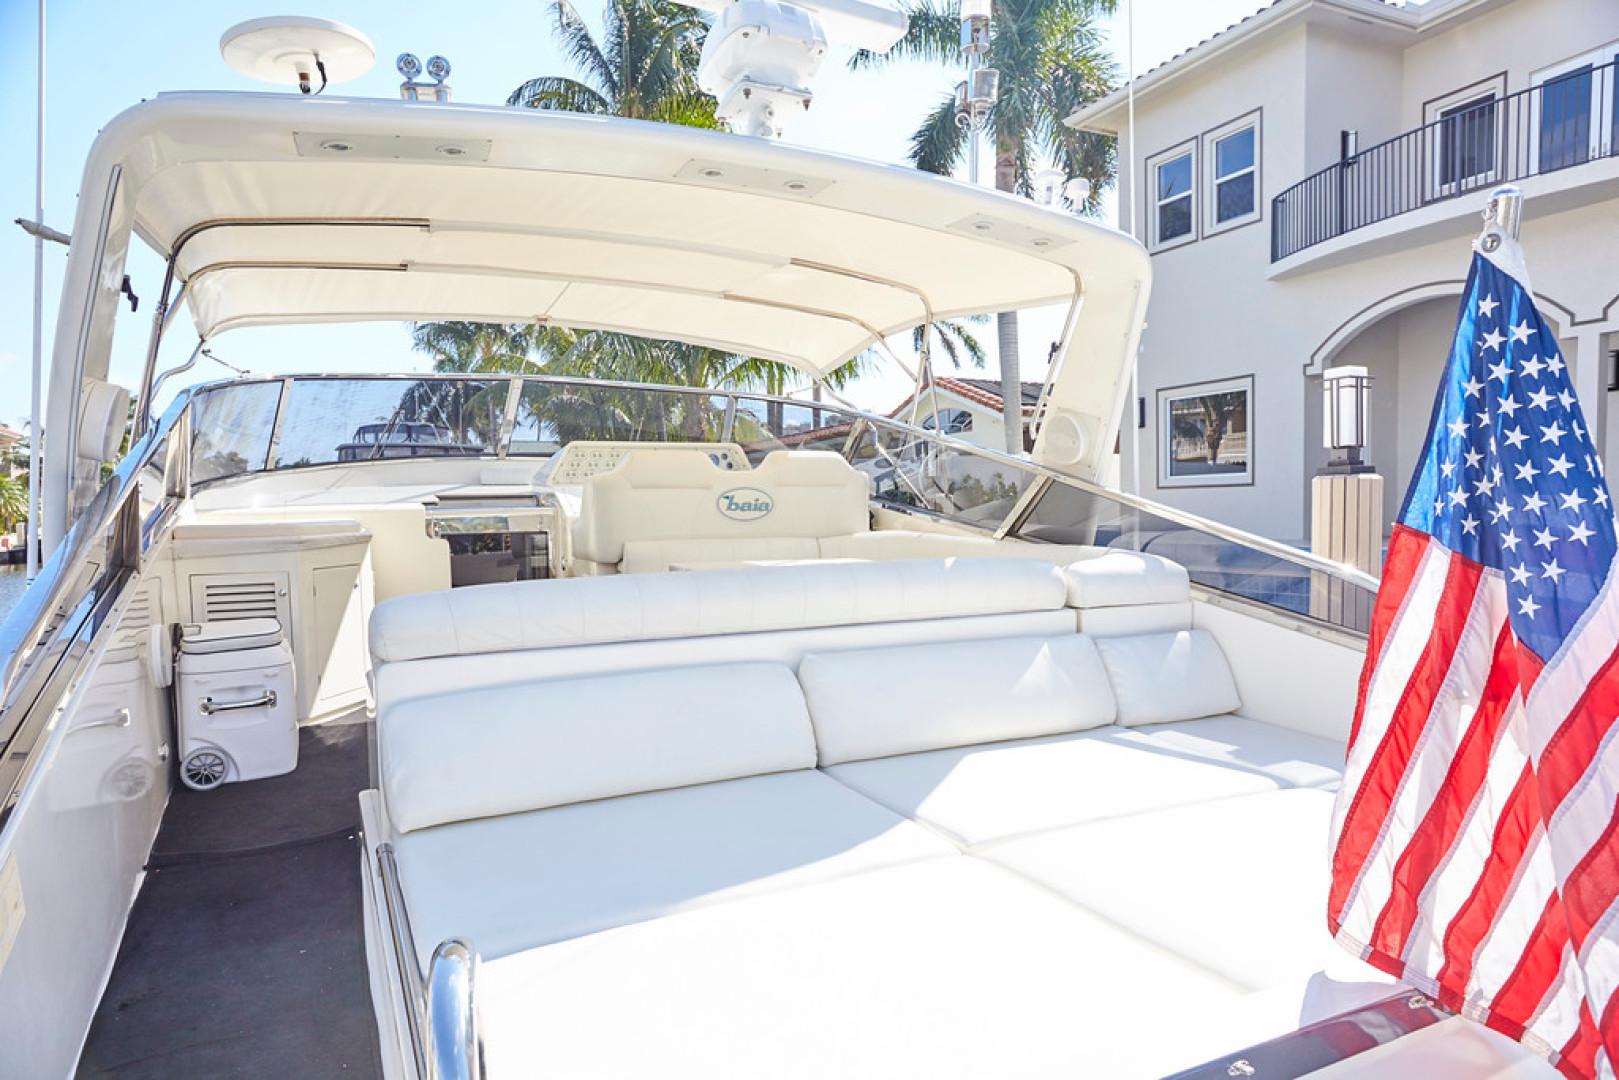 Baia-Sports Cruiser 1998 -Fort Lauderdale-Florida-United States-1275612 | Thumbnail